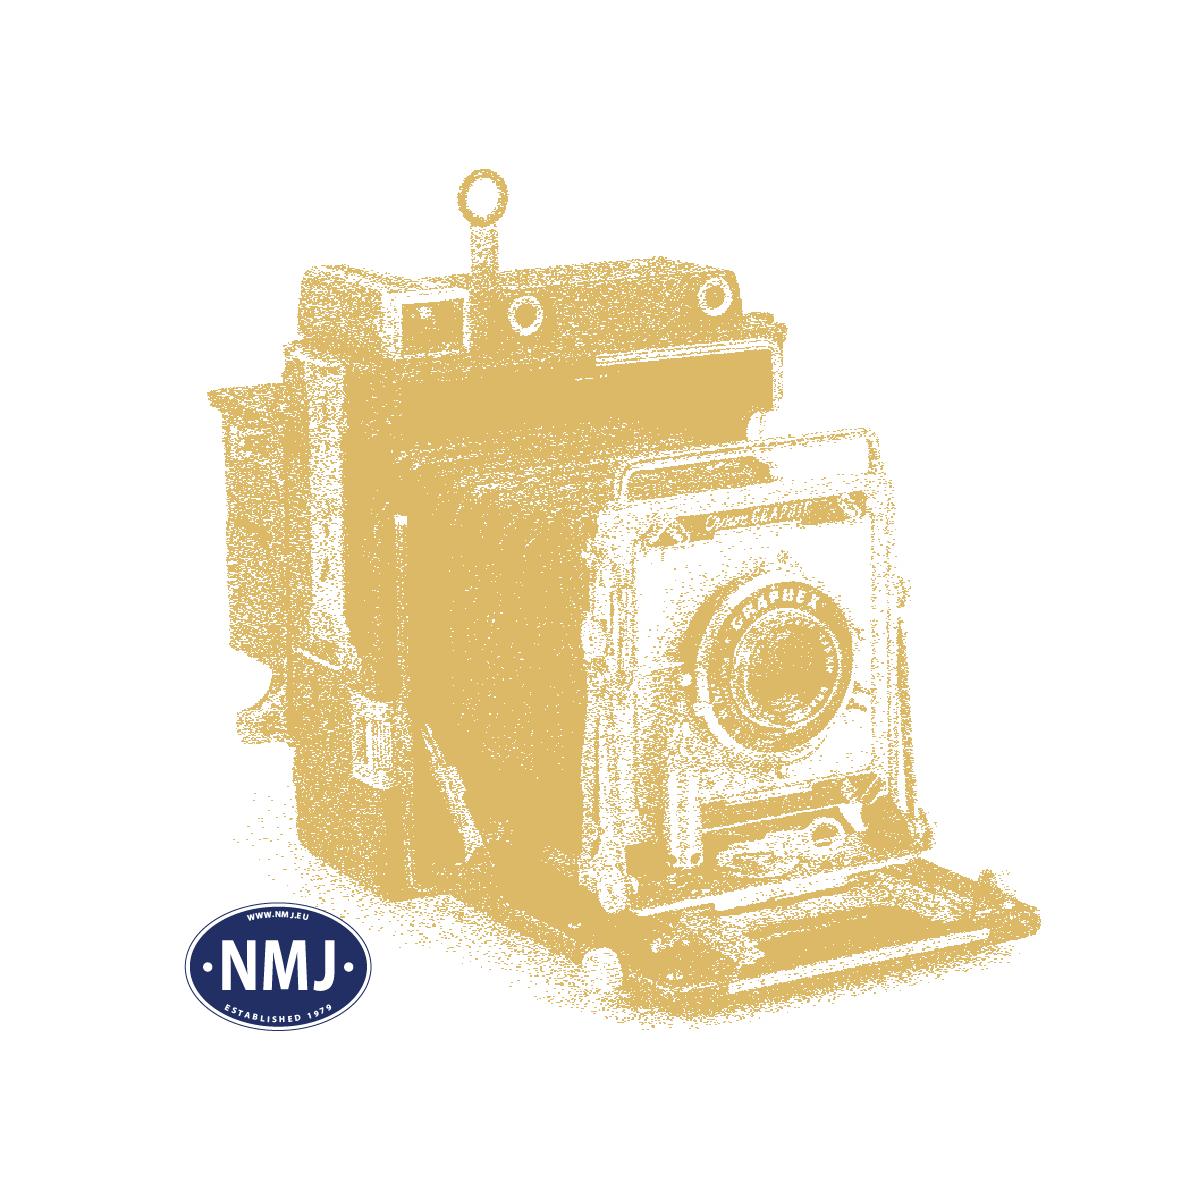 NMJT245002 - NMJ Topline NSB Di3.623 Gammeldesign (rotbraun), Spur 0, DCC m/ Sound